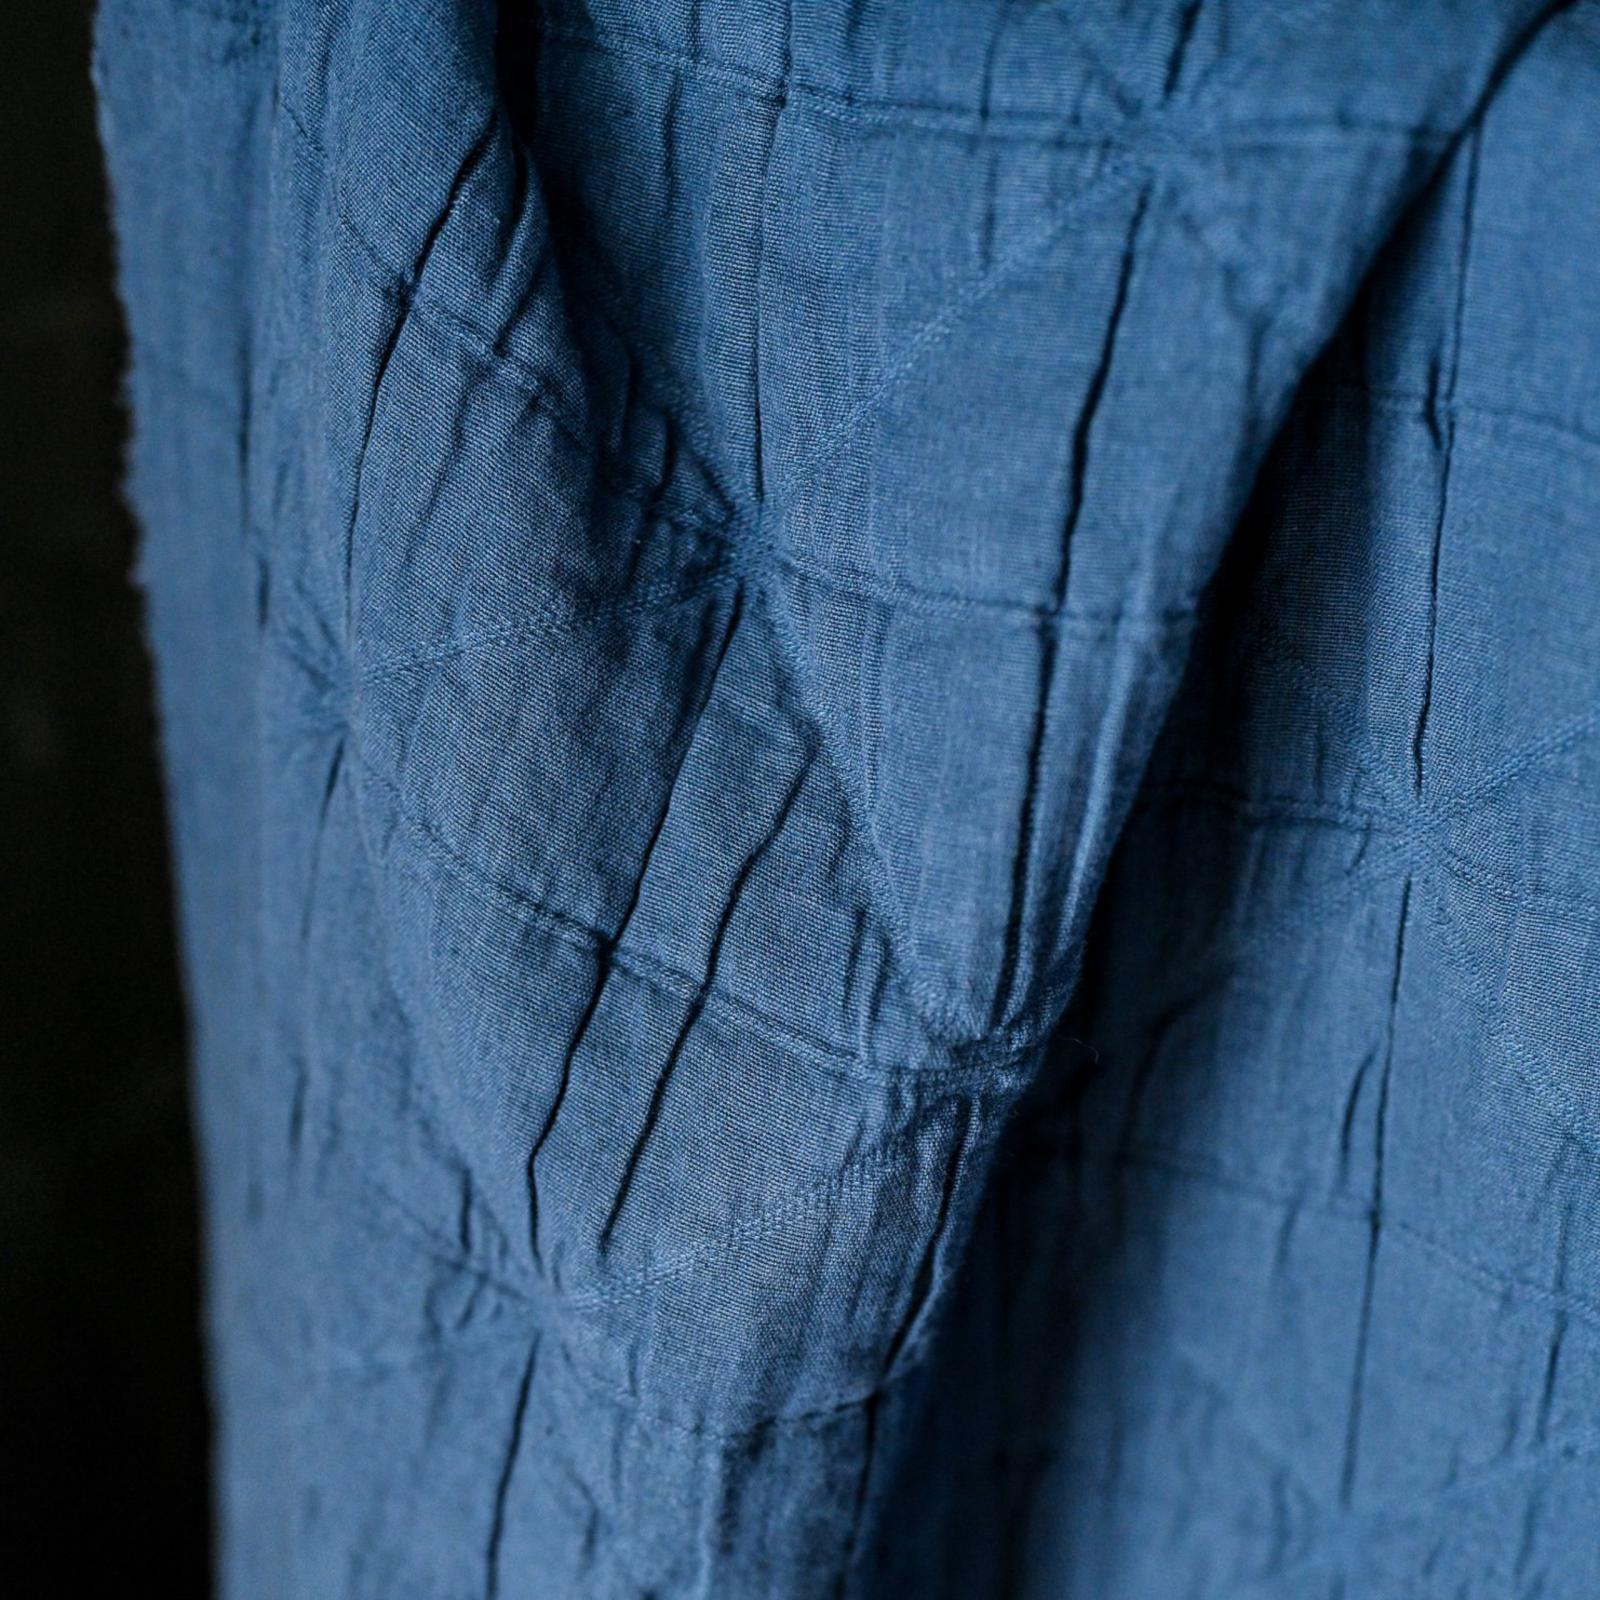 Merchant & Mills Jacquard Cotton - Blue